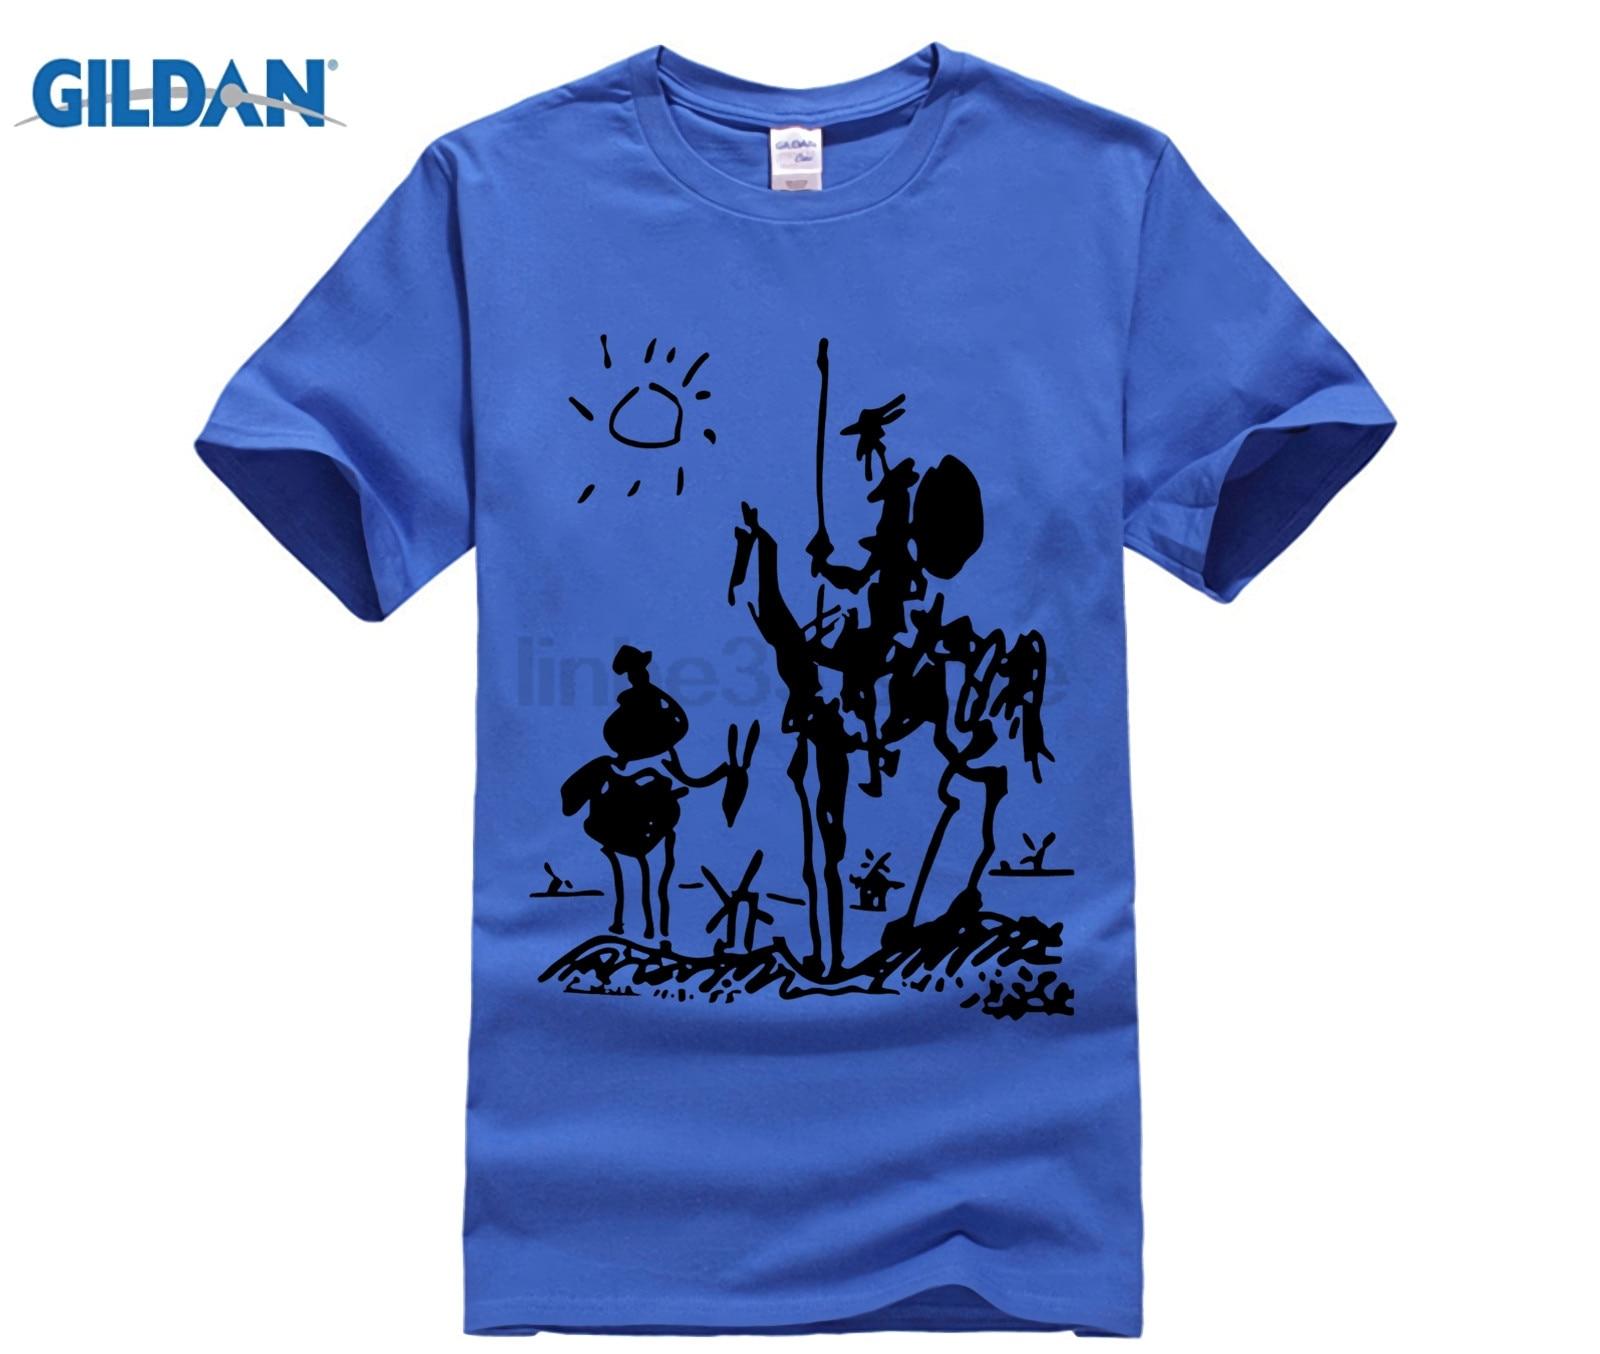 Traditional Picasso Art Painting Men Short Sleeve T Shirt Cotton Tee Tshirt Ny Donquixote Knight Women From Clothing Picasso Art Painting Men Short Sleeve T Shirt Cotton Tee Tshirt